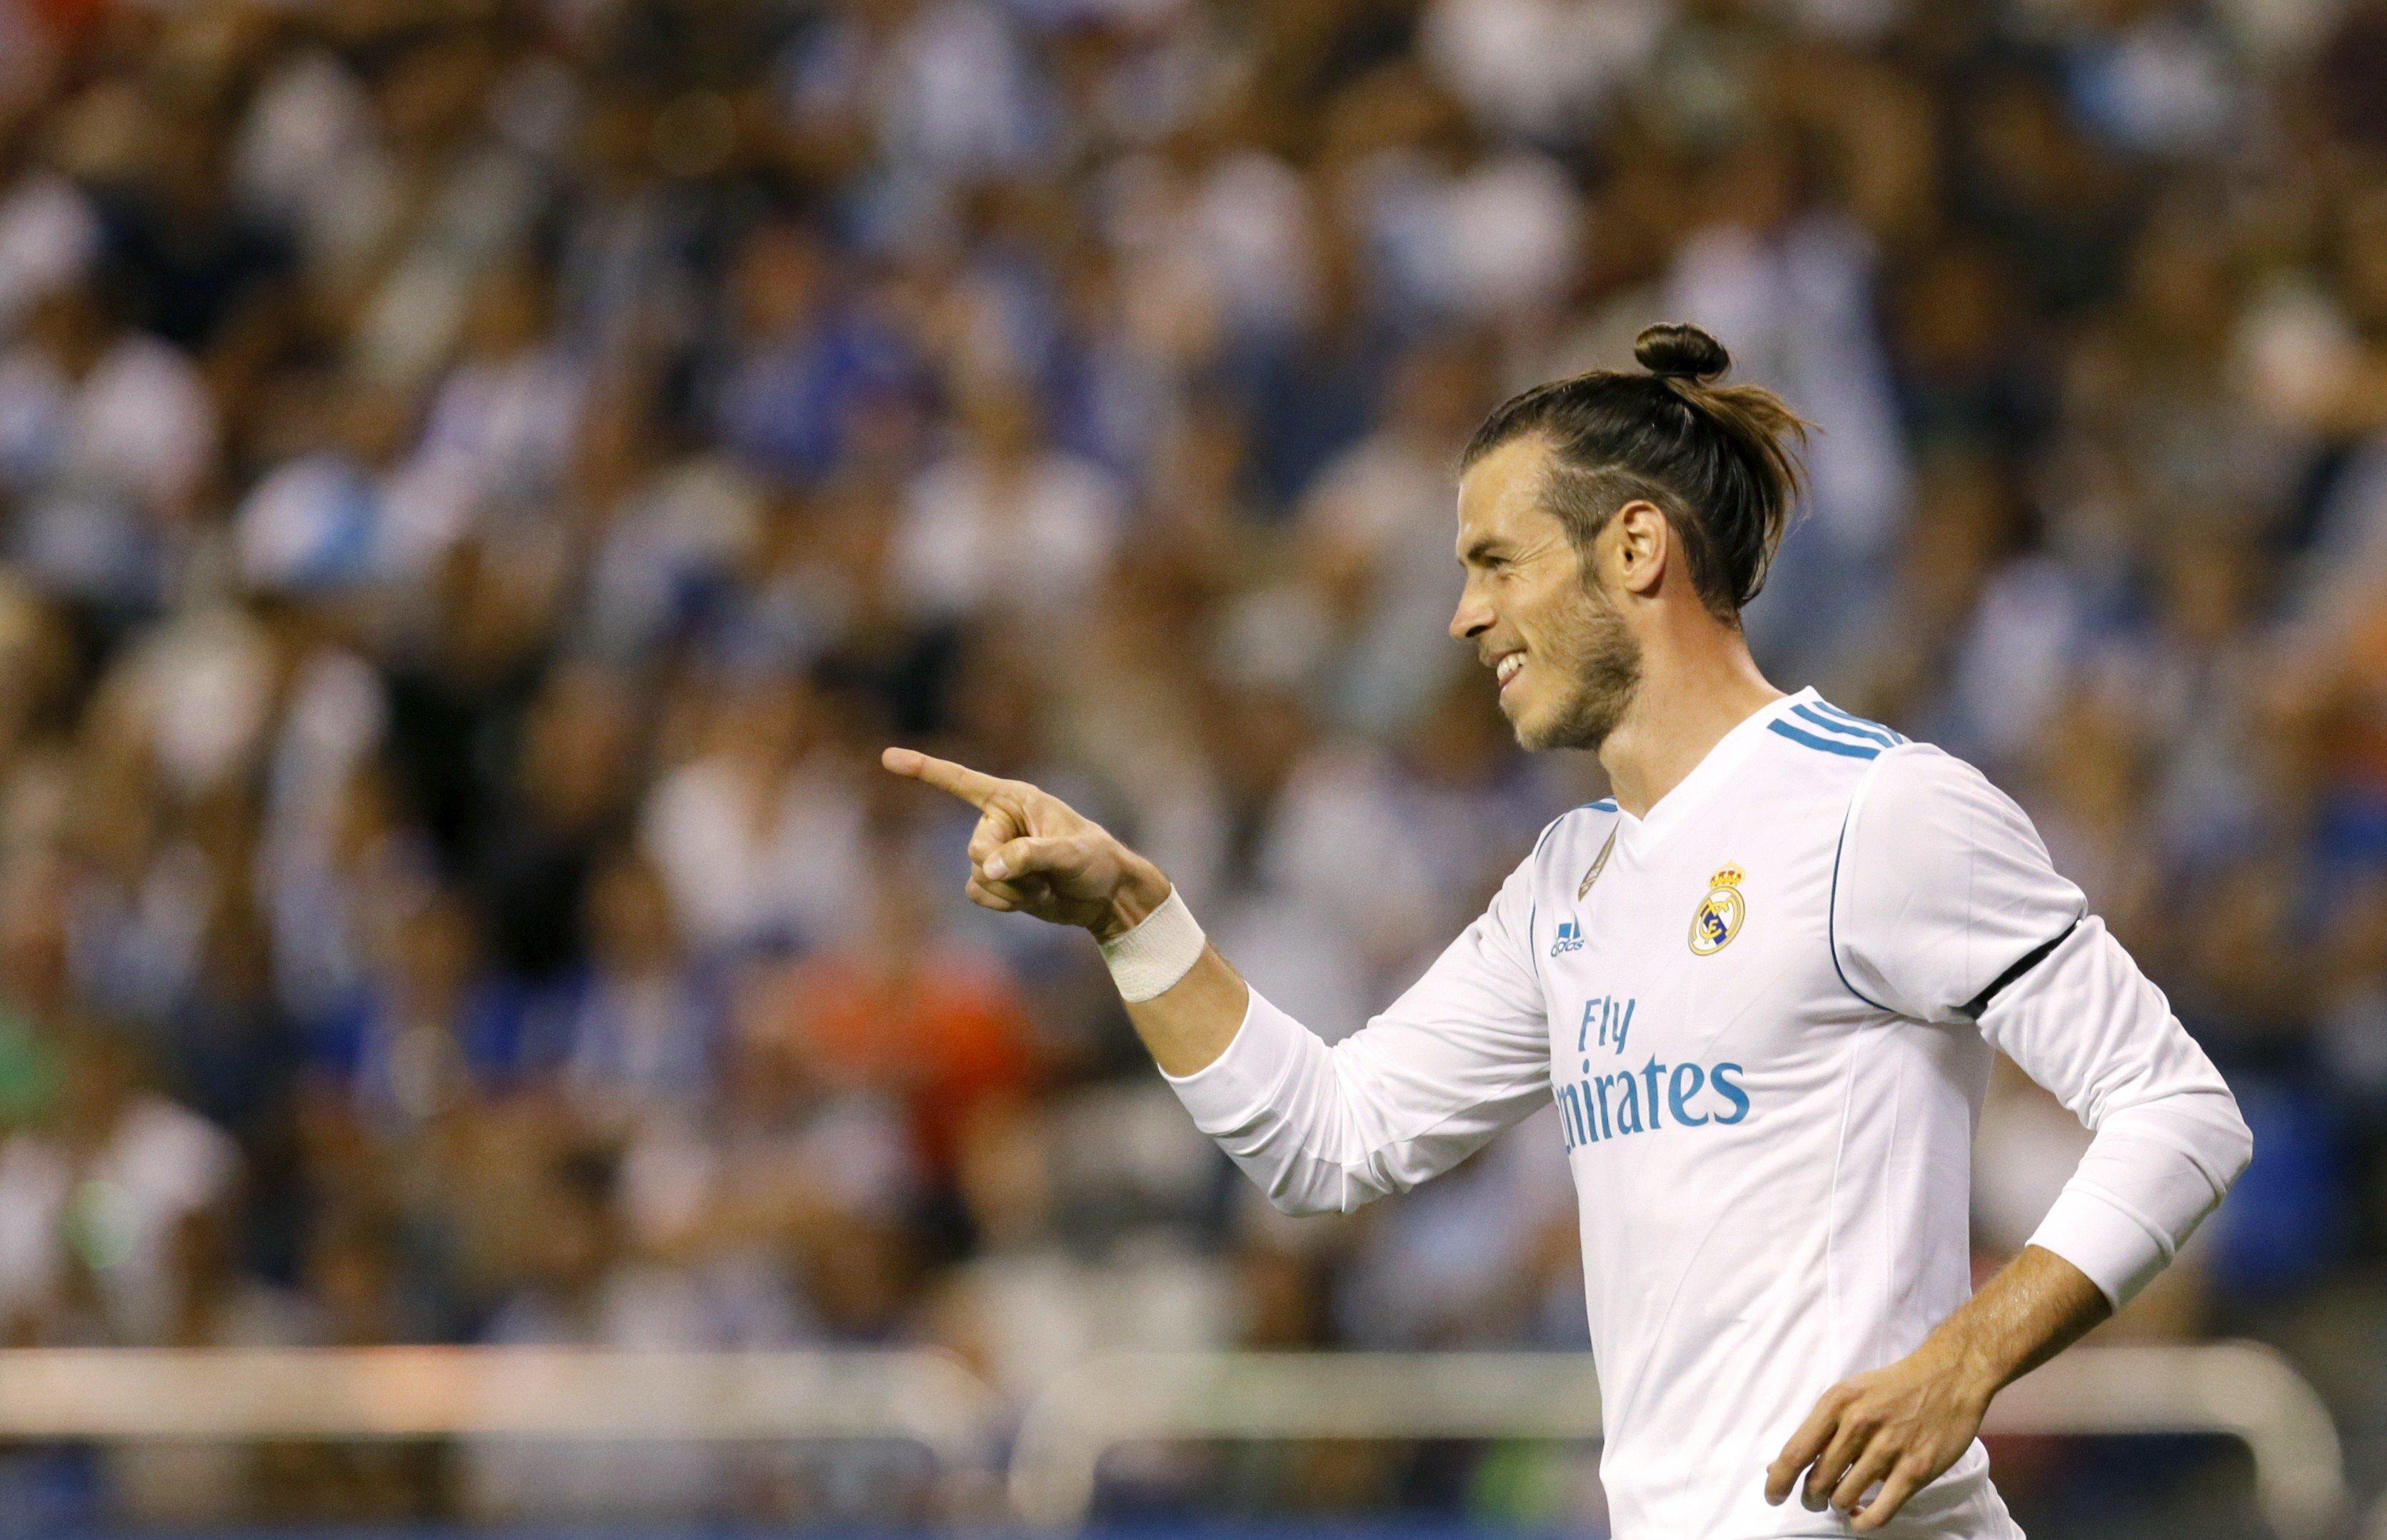 Gareth Bale Reial Madrid gol Deportivo Corunya   EFE